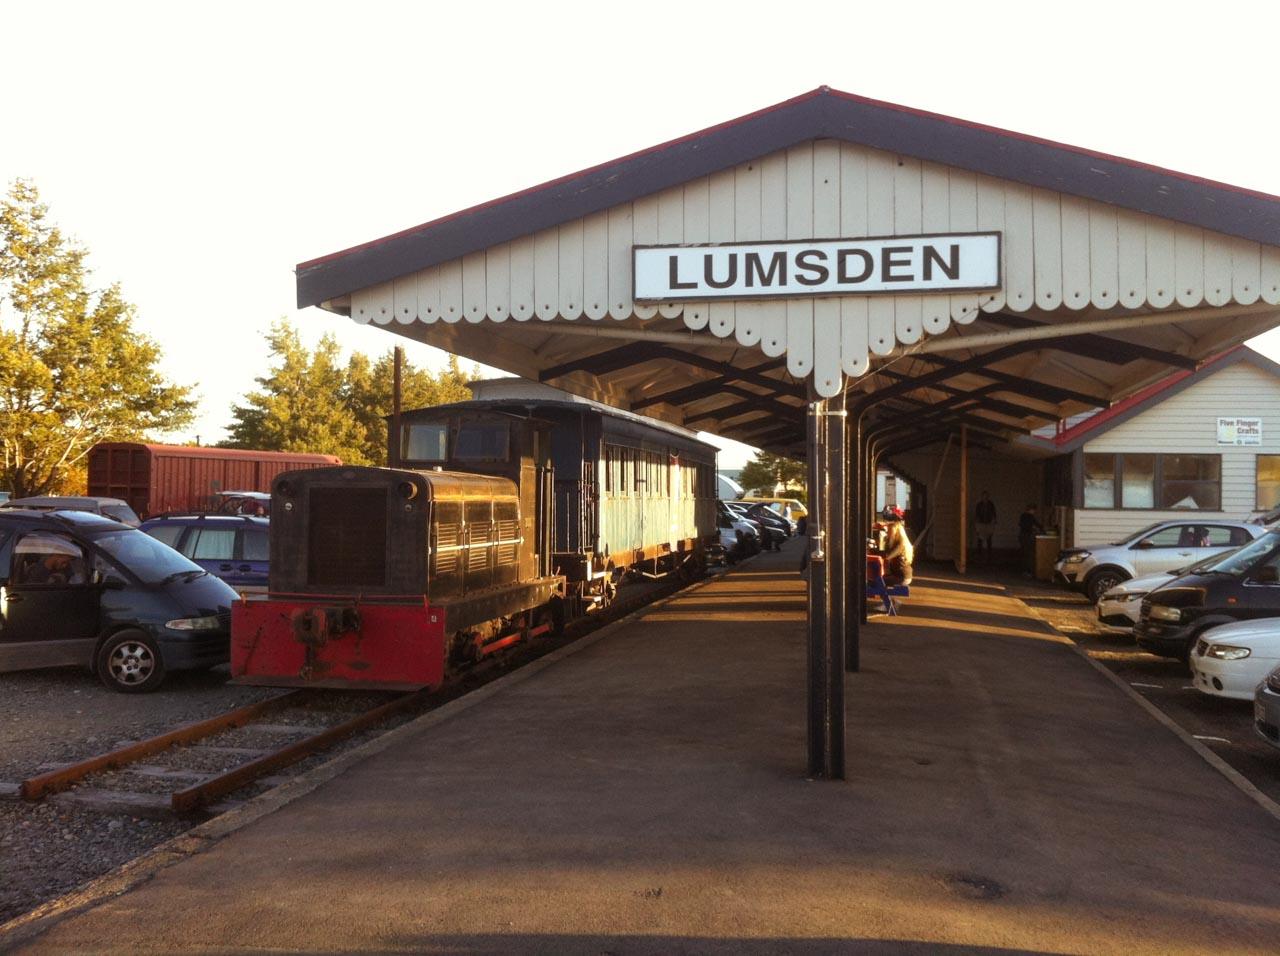 Lumsden Free Campsite